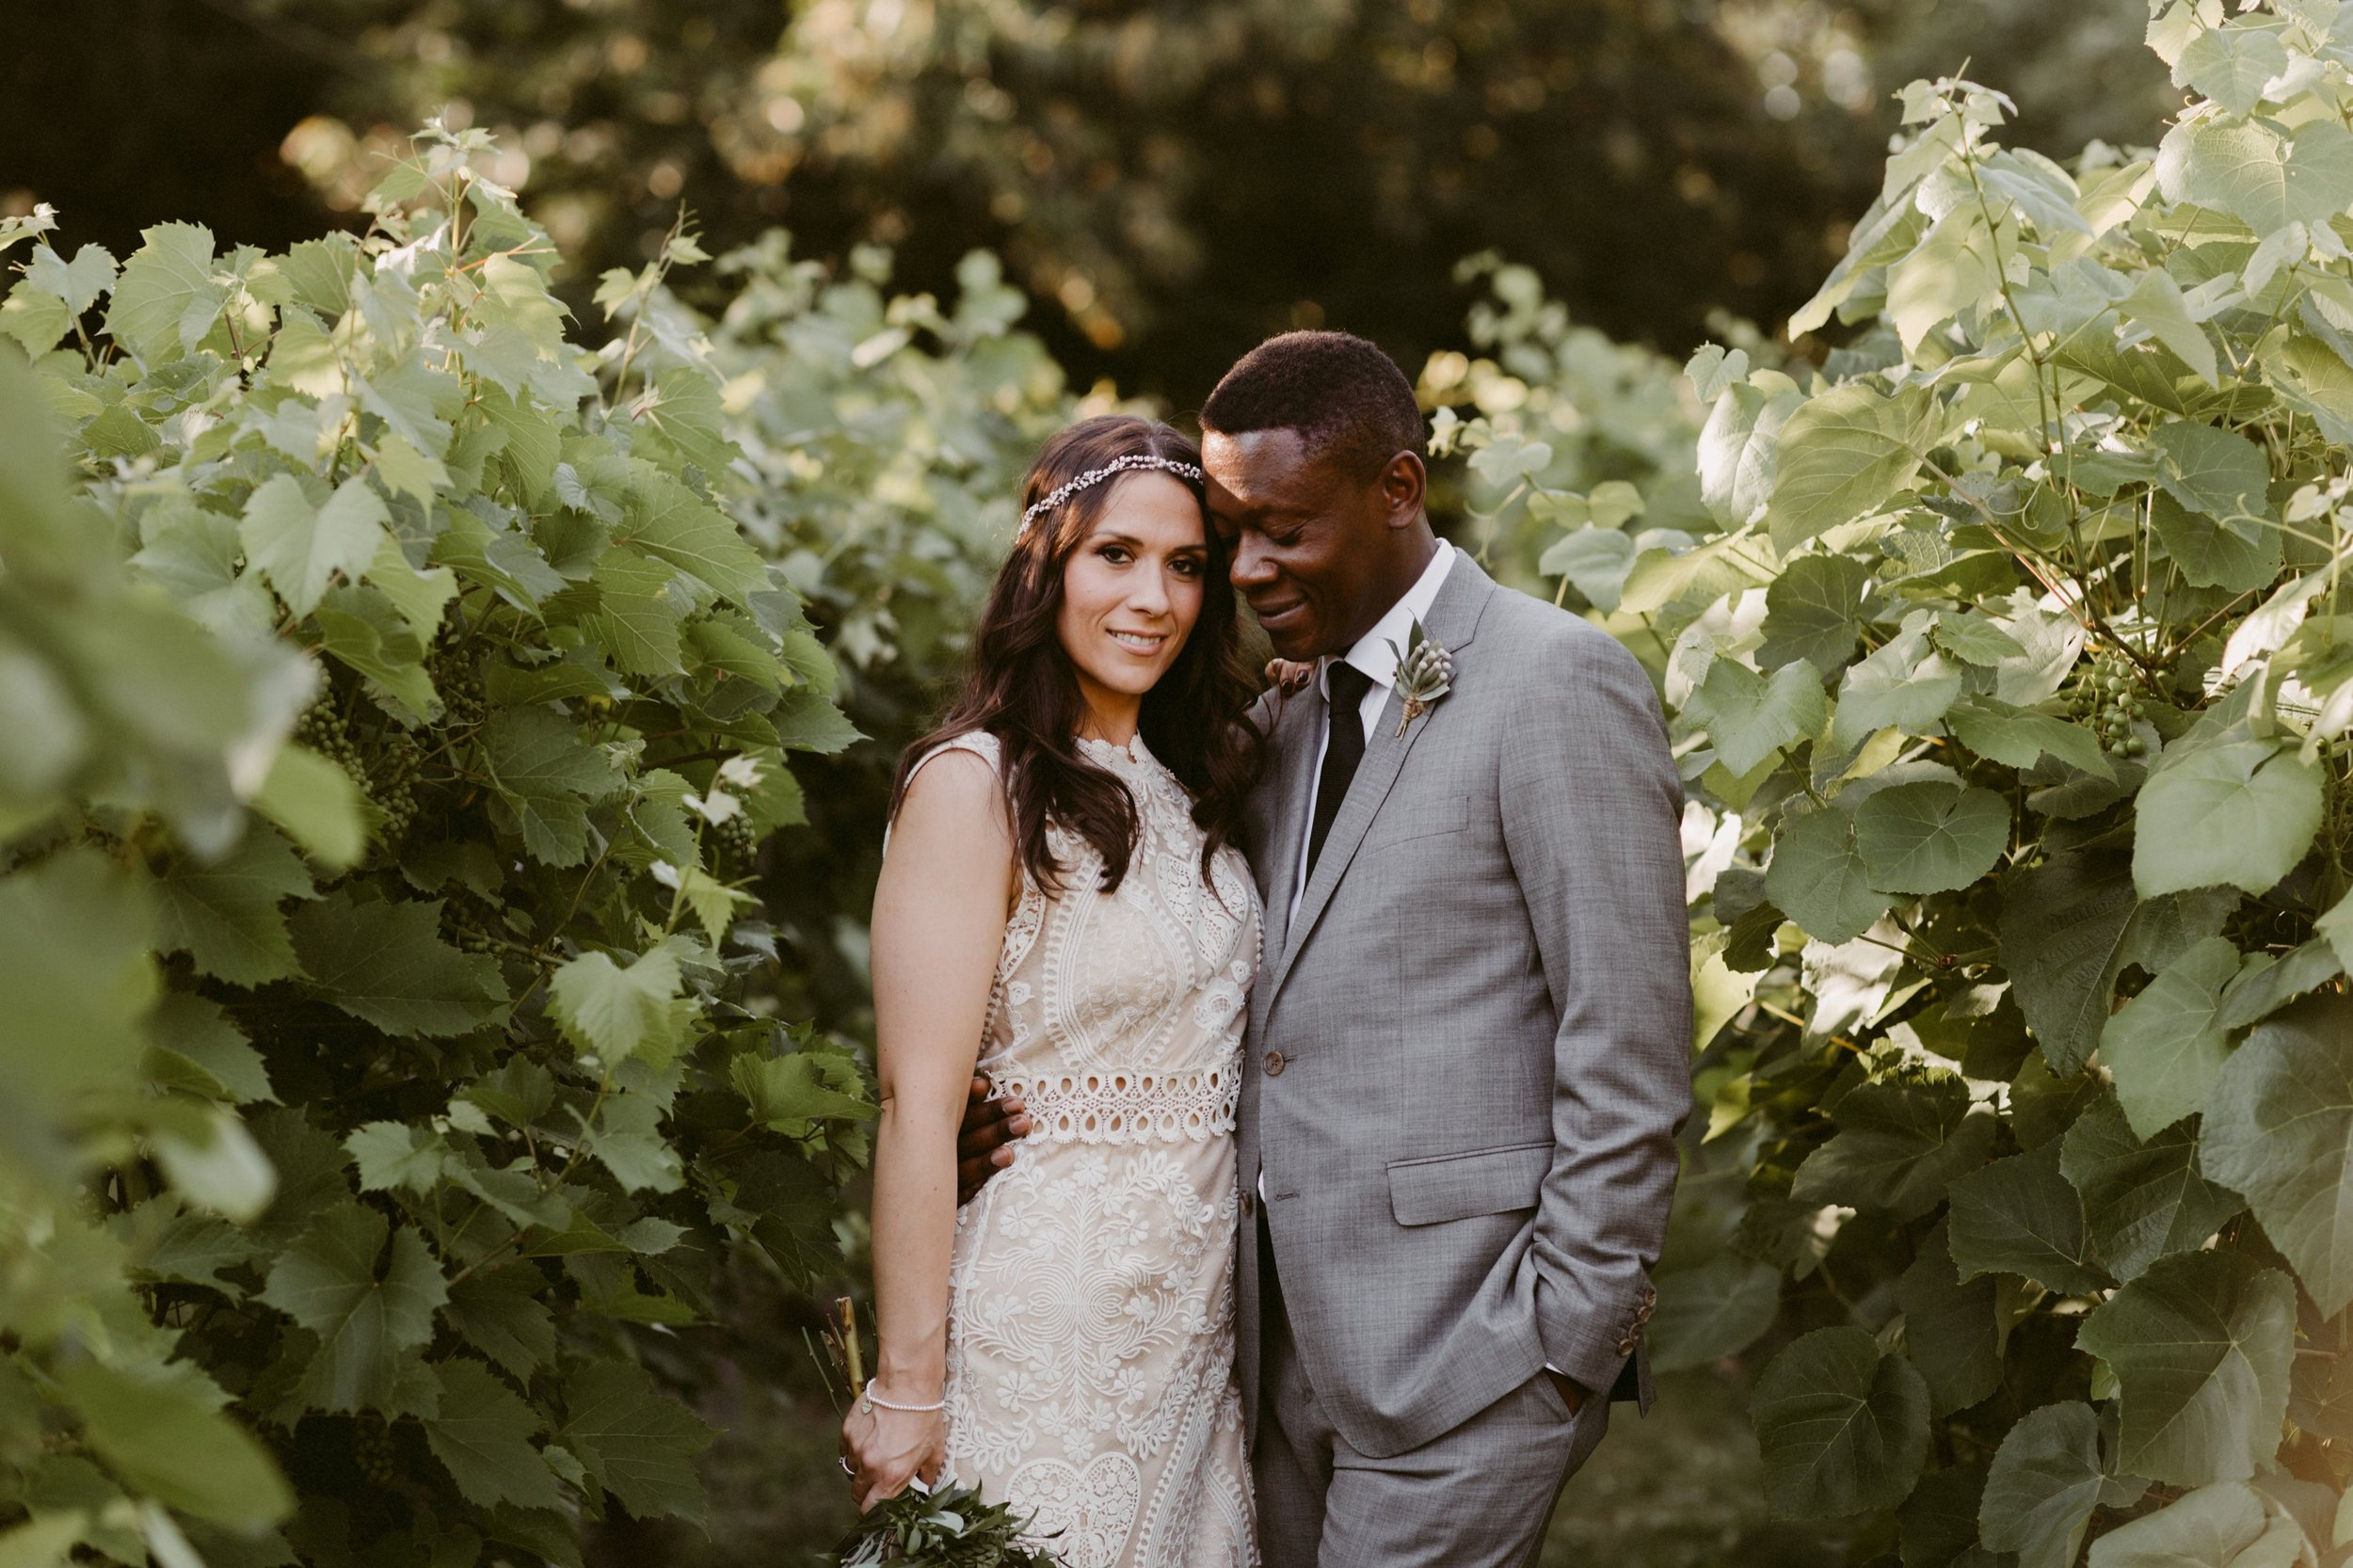 049_Spadina House Wedding (320 of 748)_House_Spadina_intimate_Toronto_Wedding.jpg